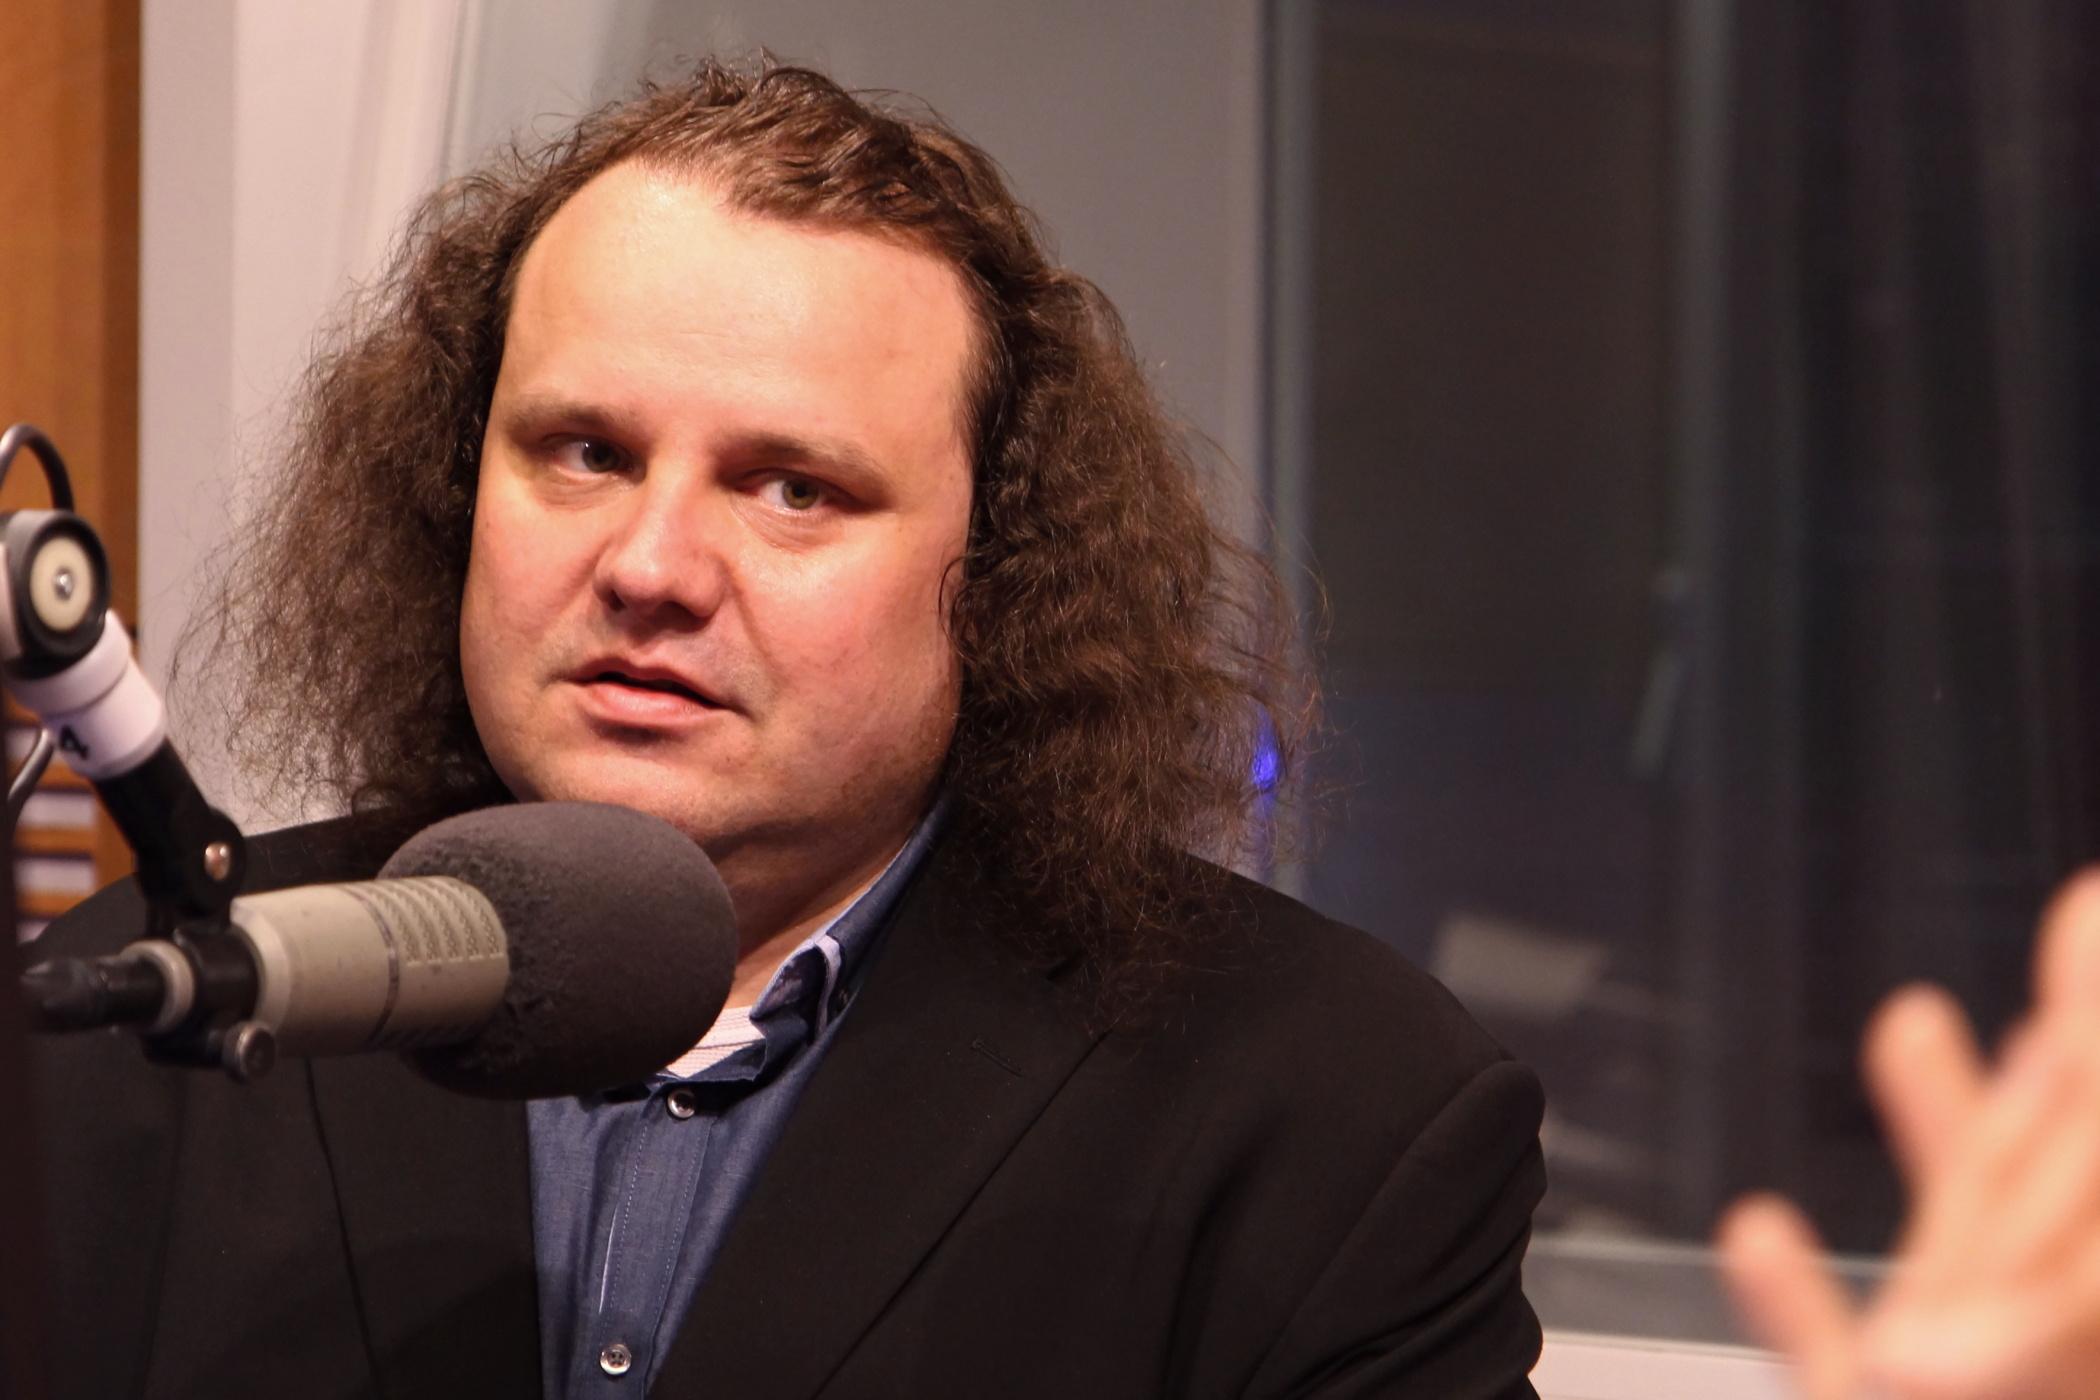 Petr Koura